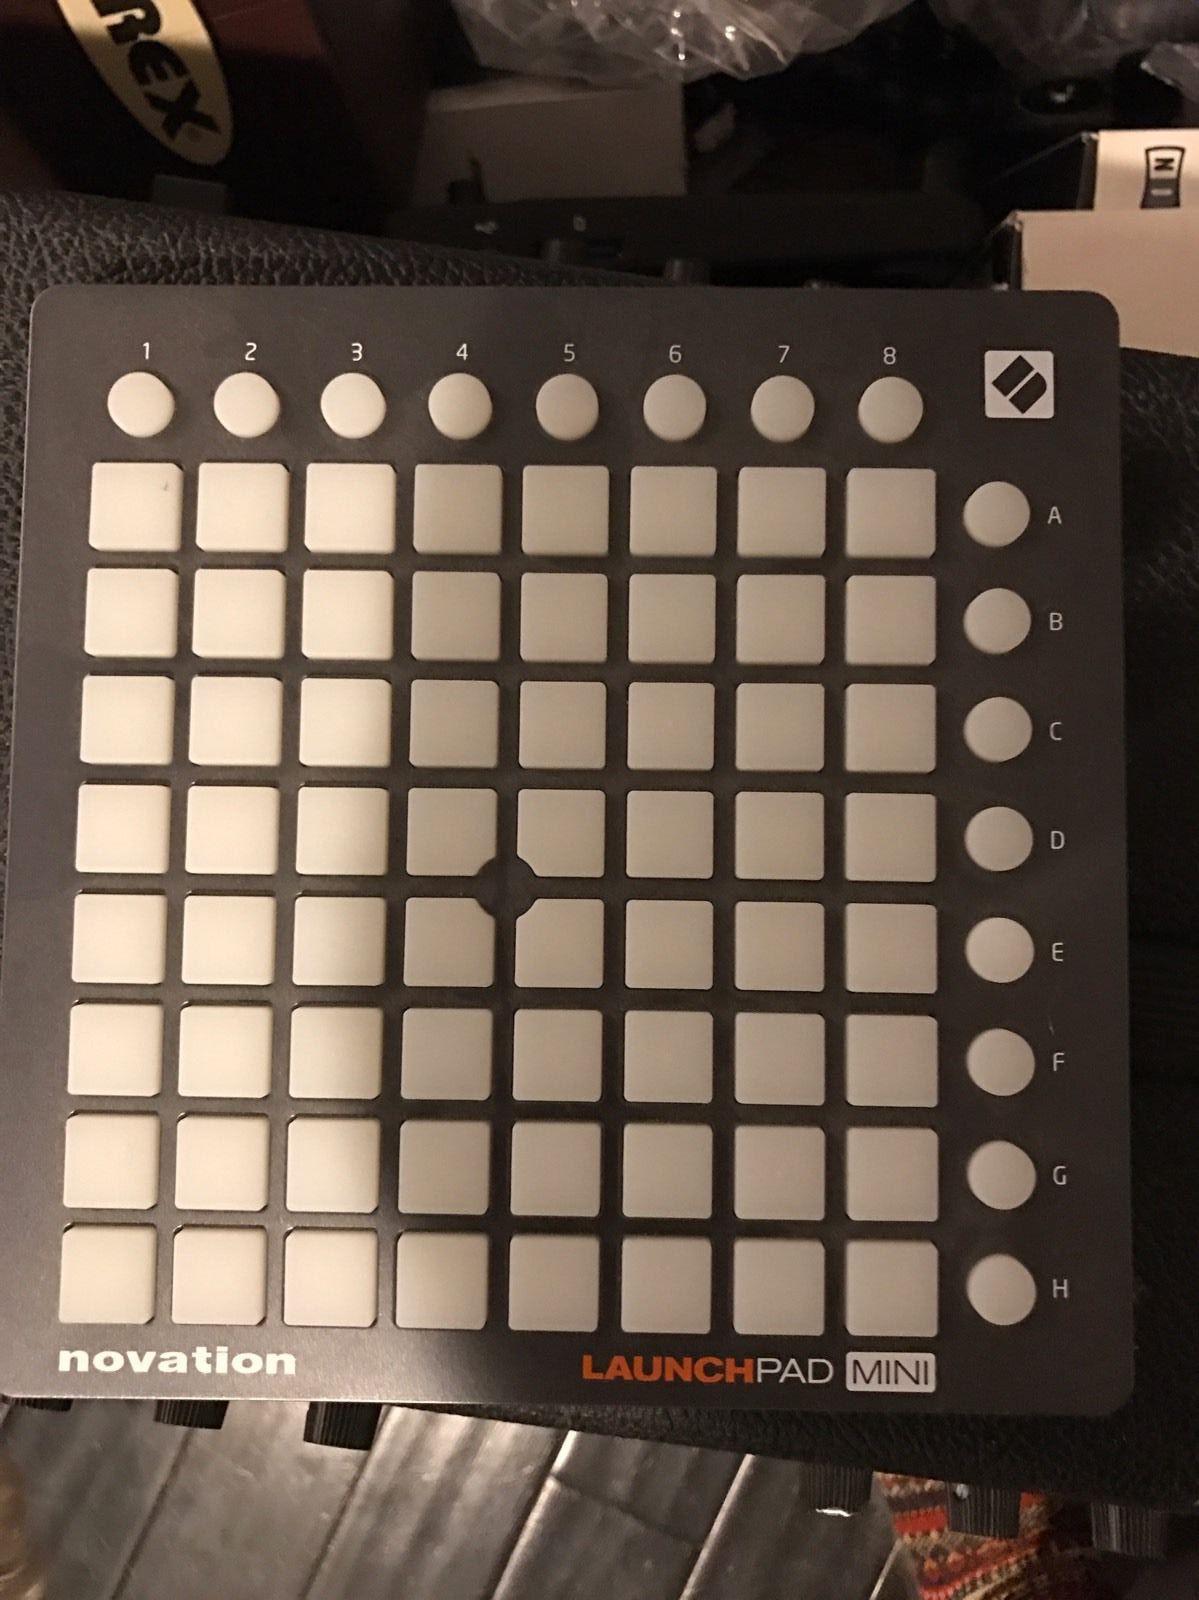 MATRIXSYNTH: Akai Max25, APC40 & Novation Launchpad Mini